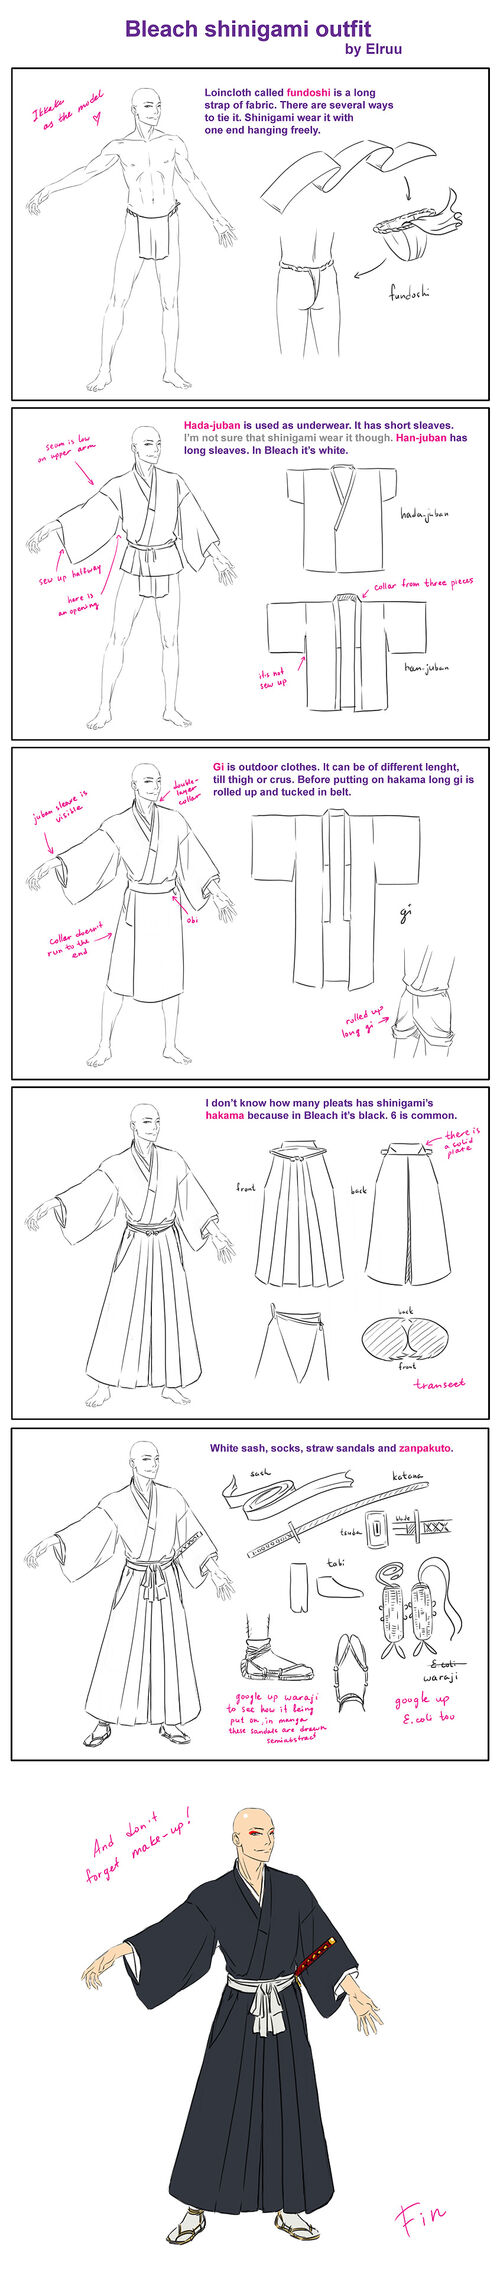 Bleach shinigami outfit by elruu